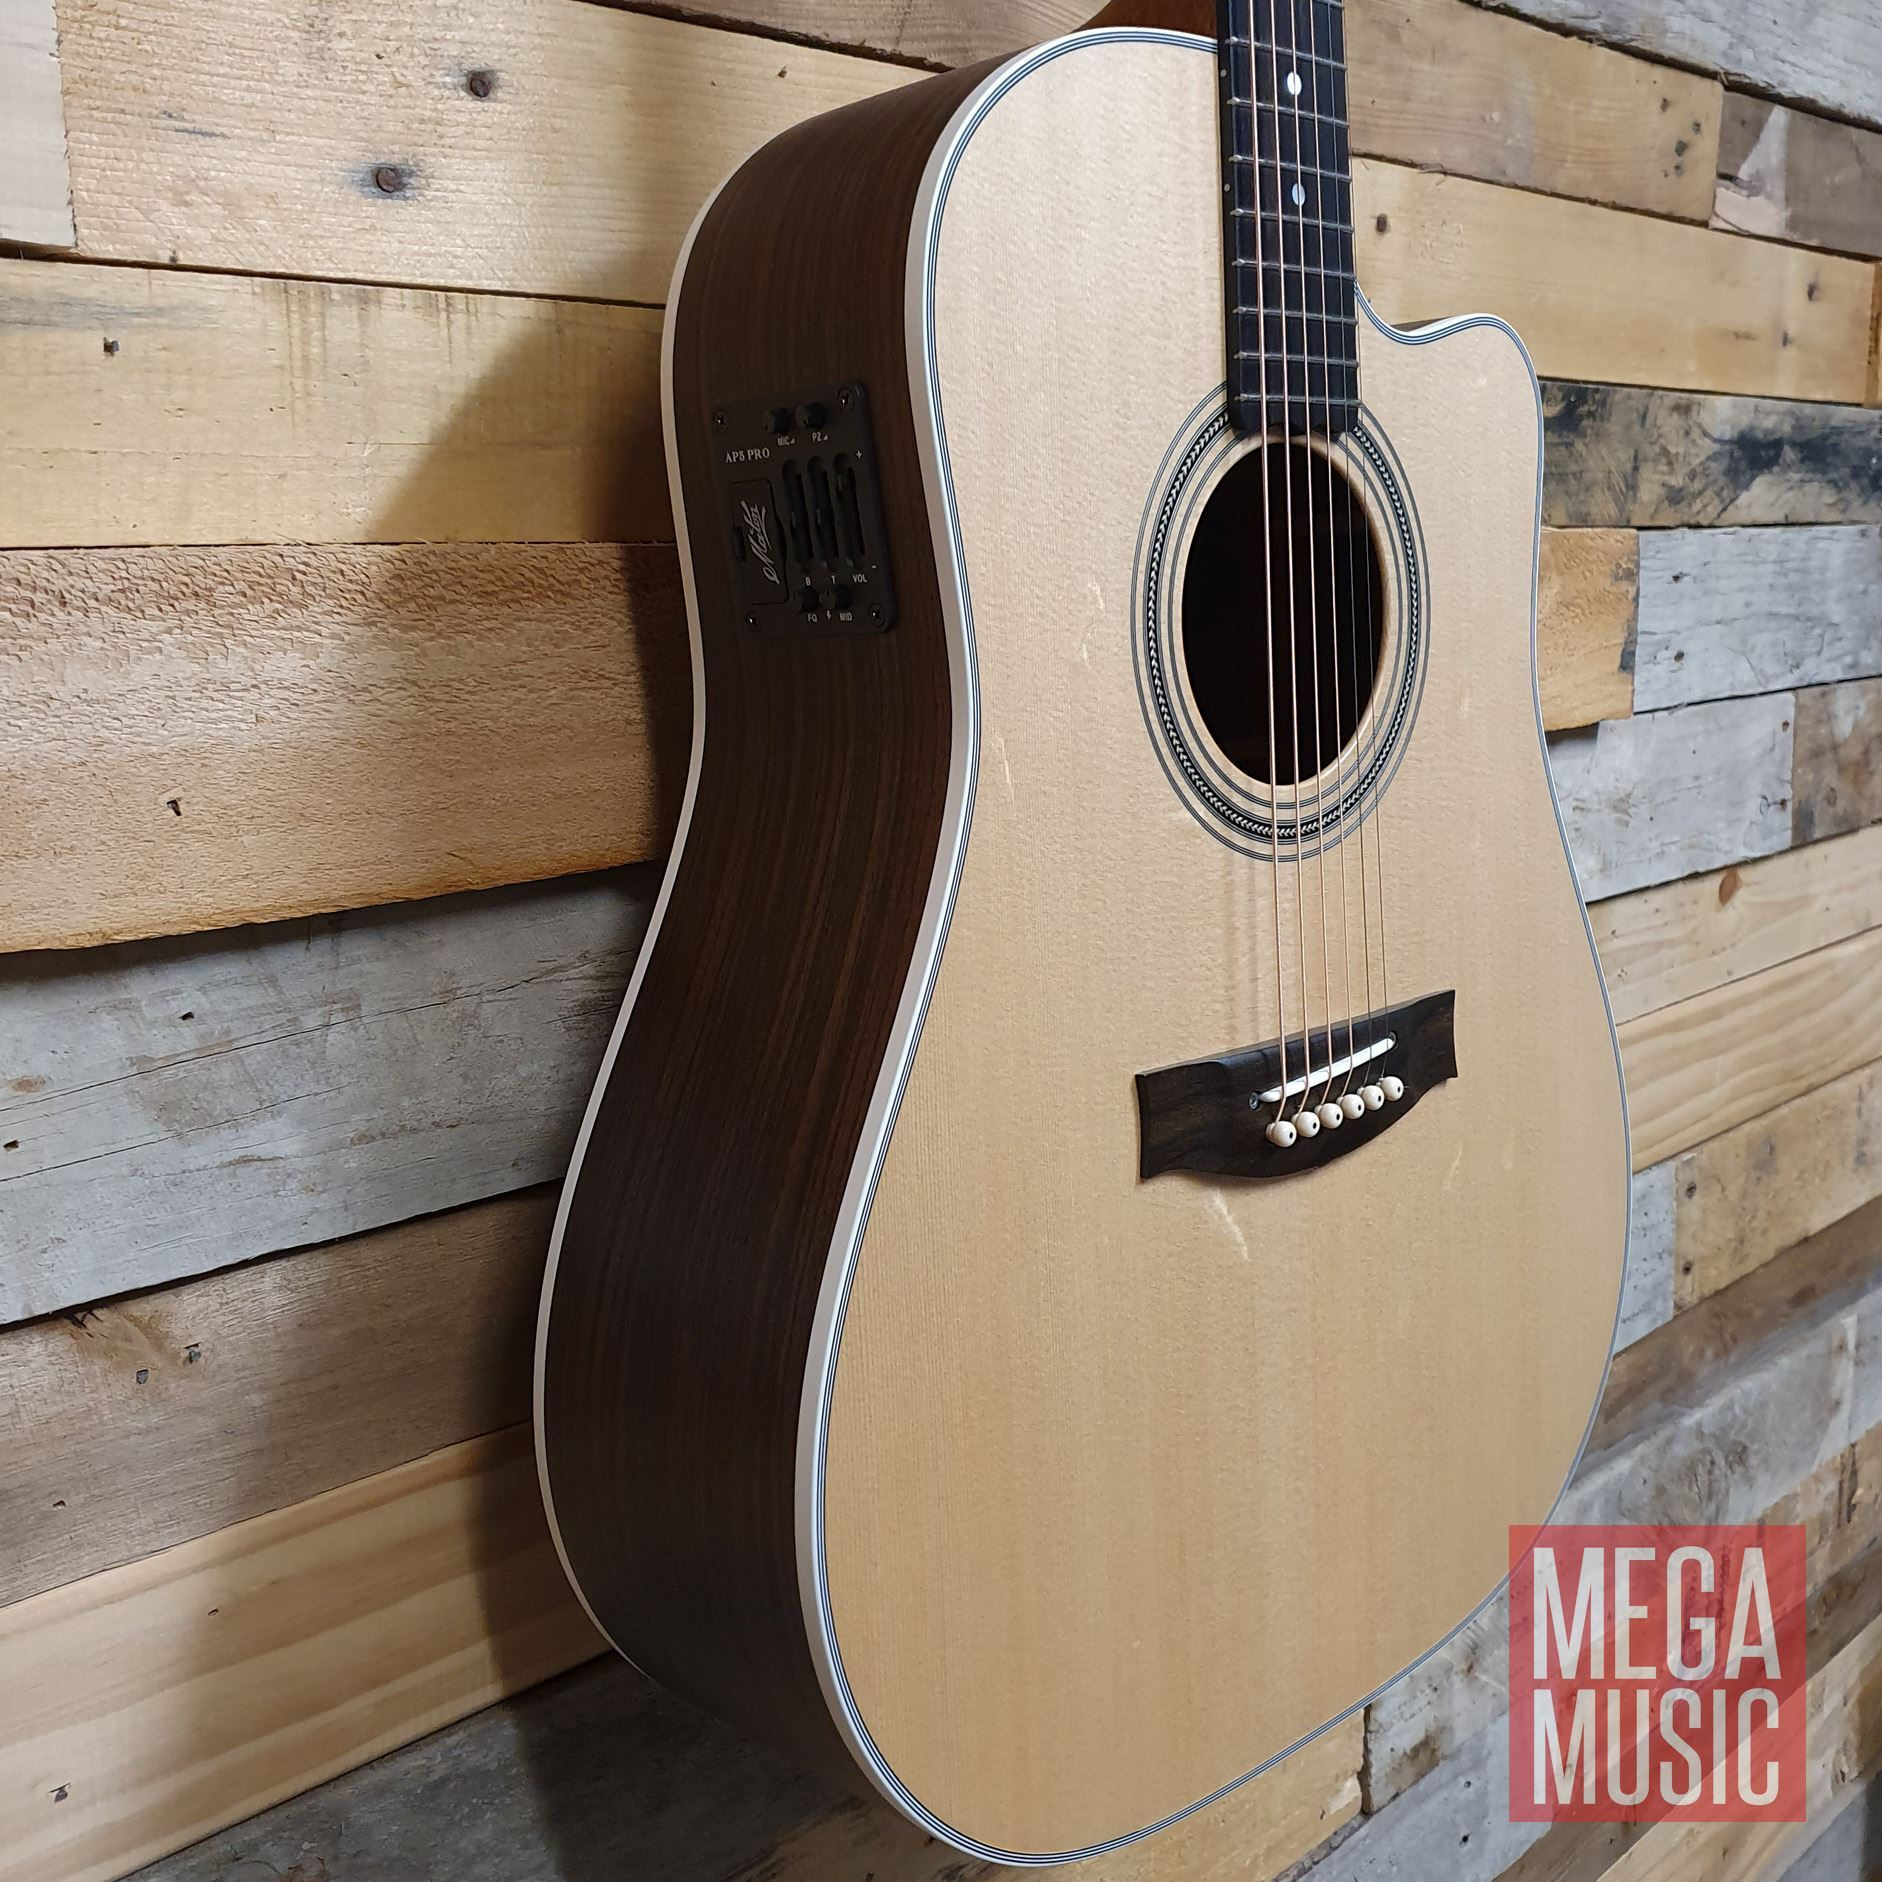 Maton ER90c Acoustic Guitar w/o Pickguard Front Body Detail